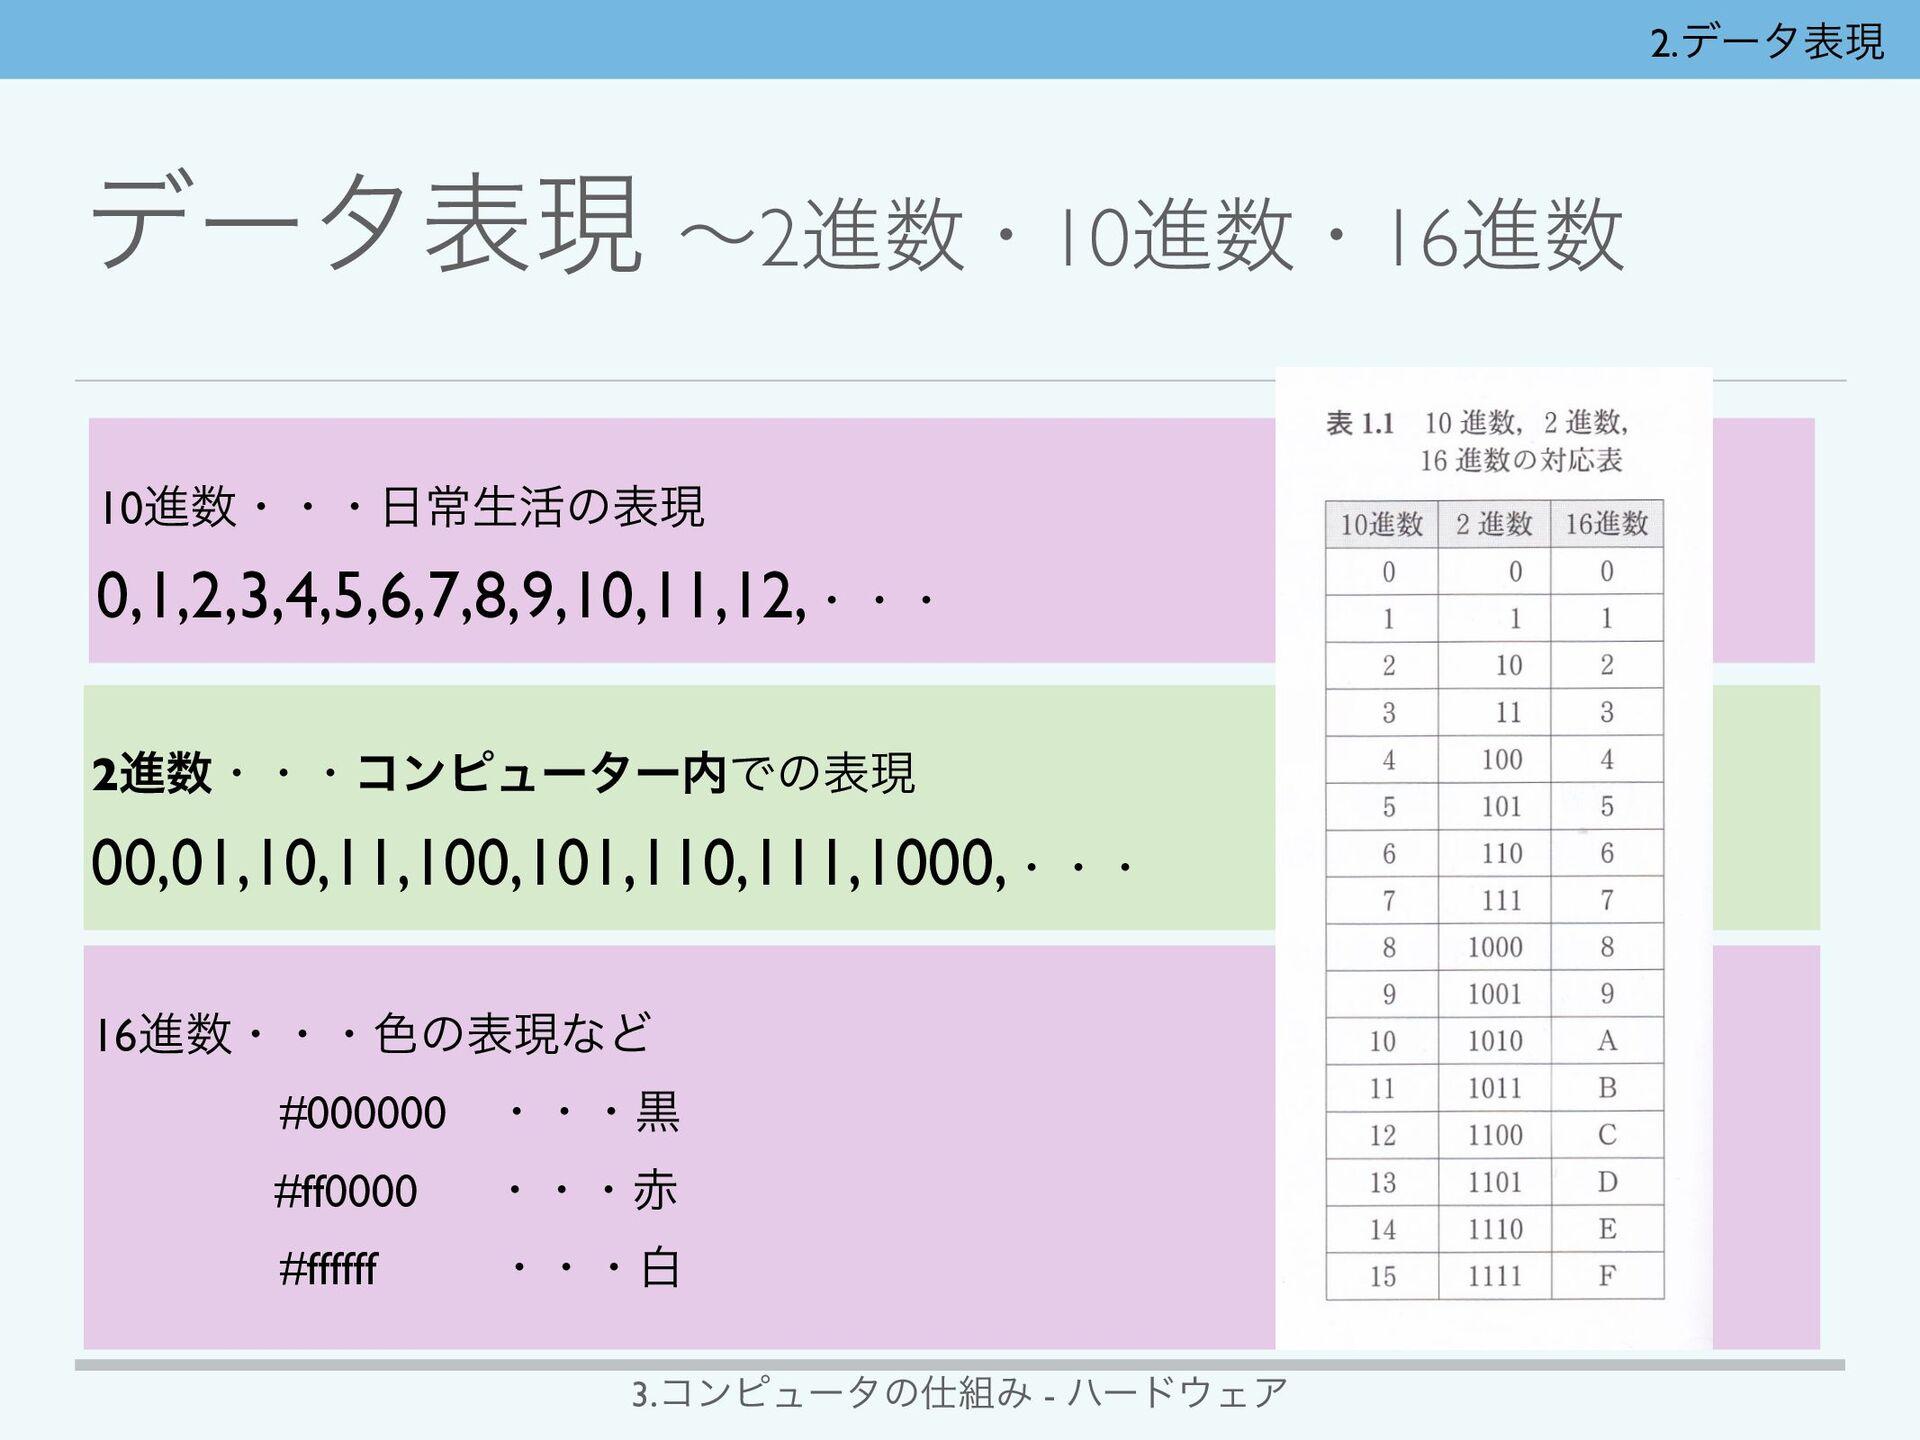 3.ίϯϐϡʔλͷΈ - ϋʔυΣΞ 2ϏοτͰදݱͰ͖Δͷ ɹɹ ɹ2ਐ → 10...